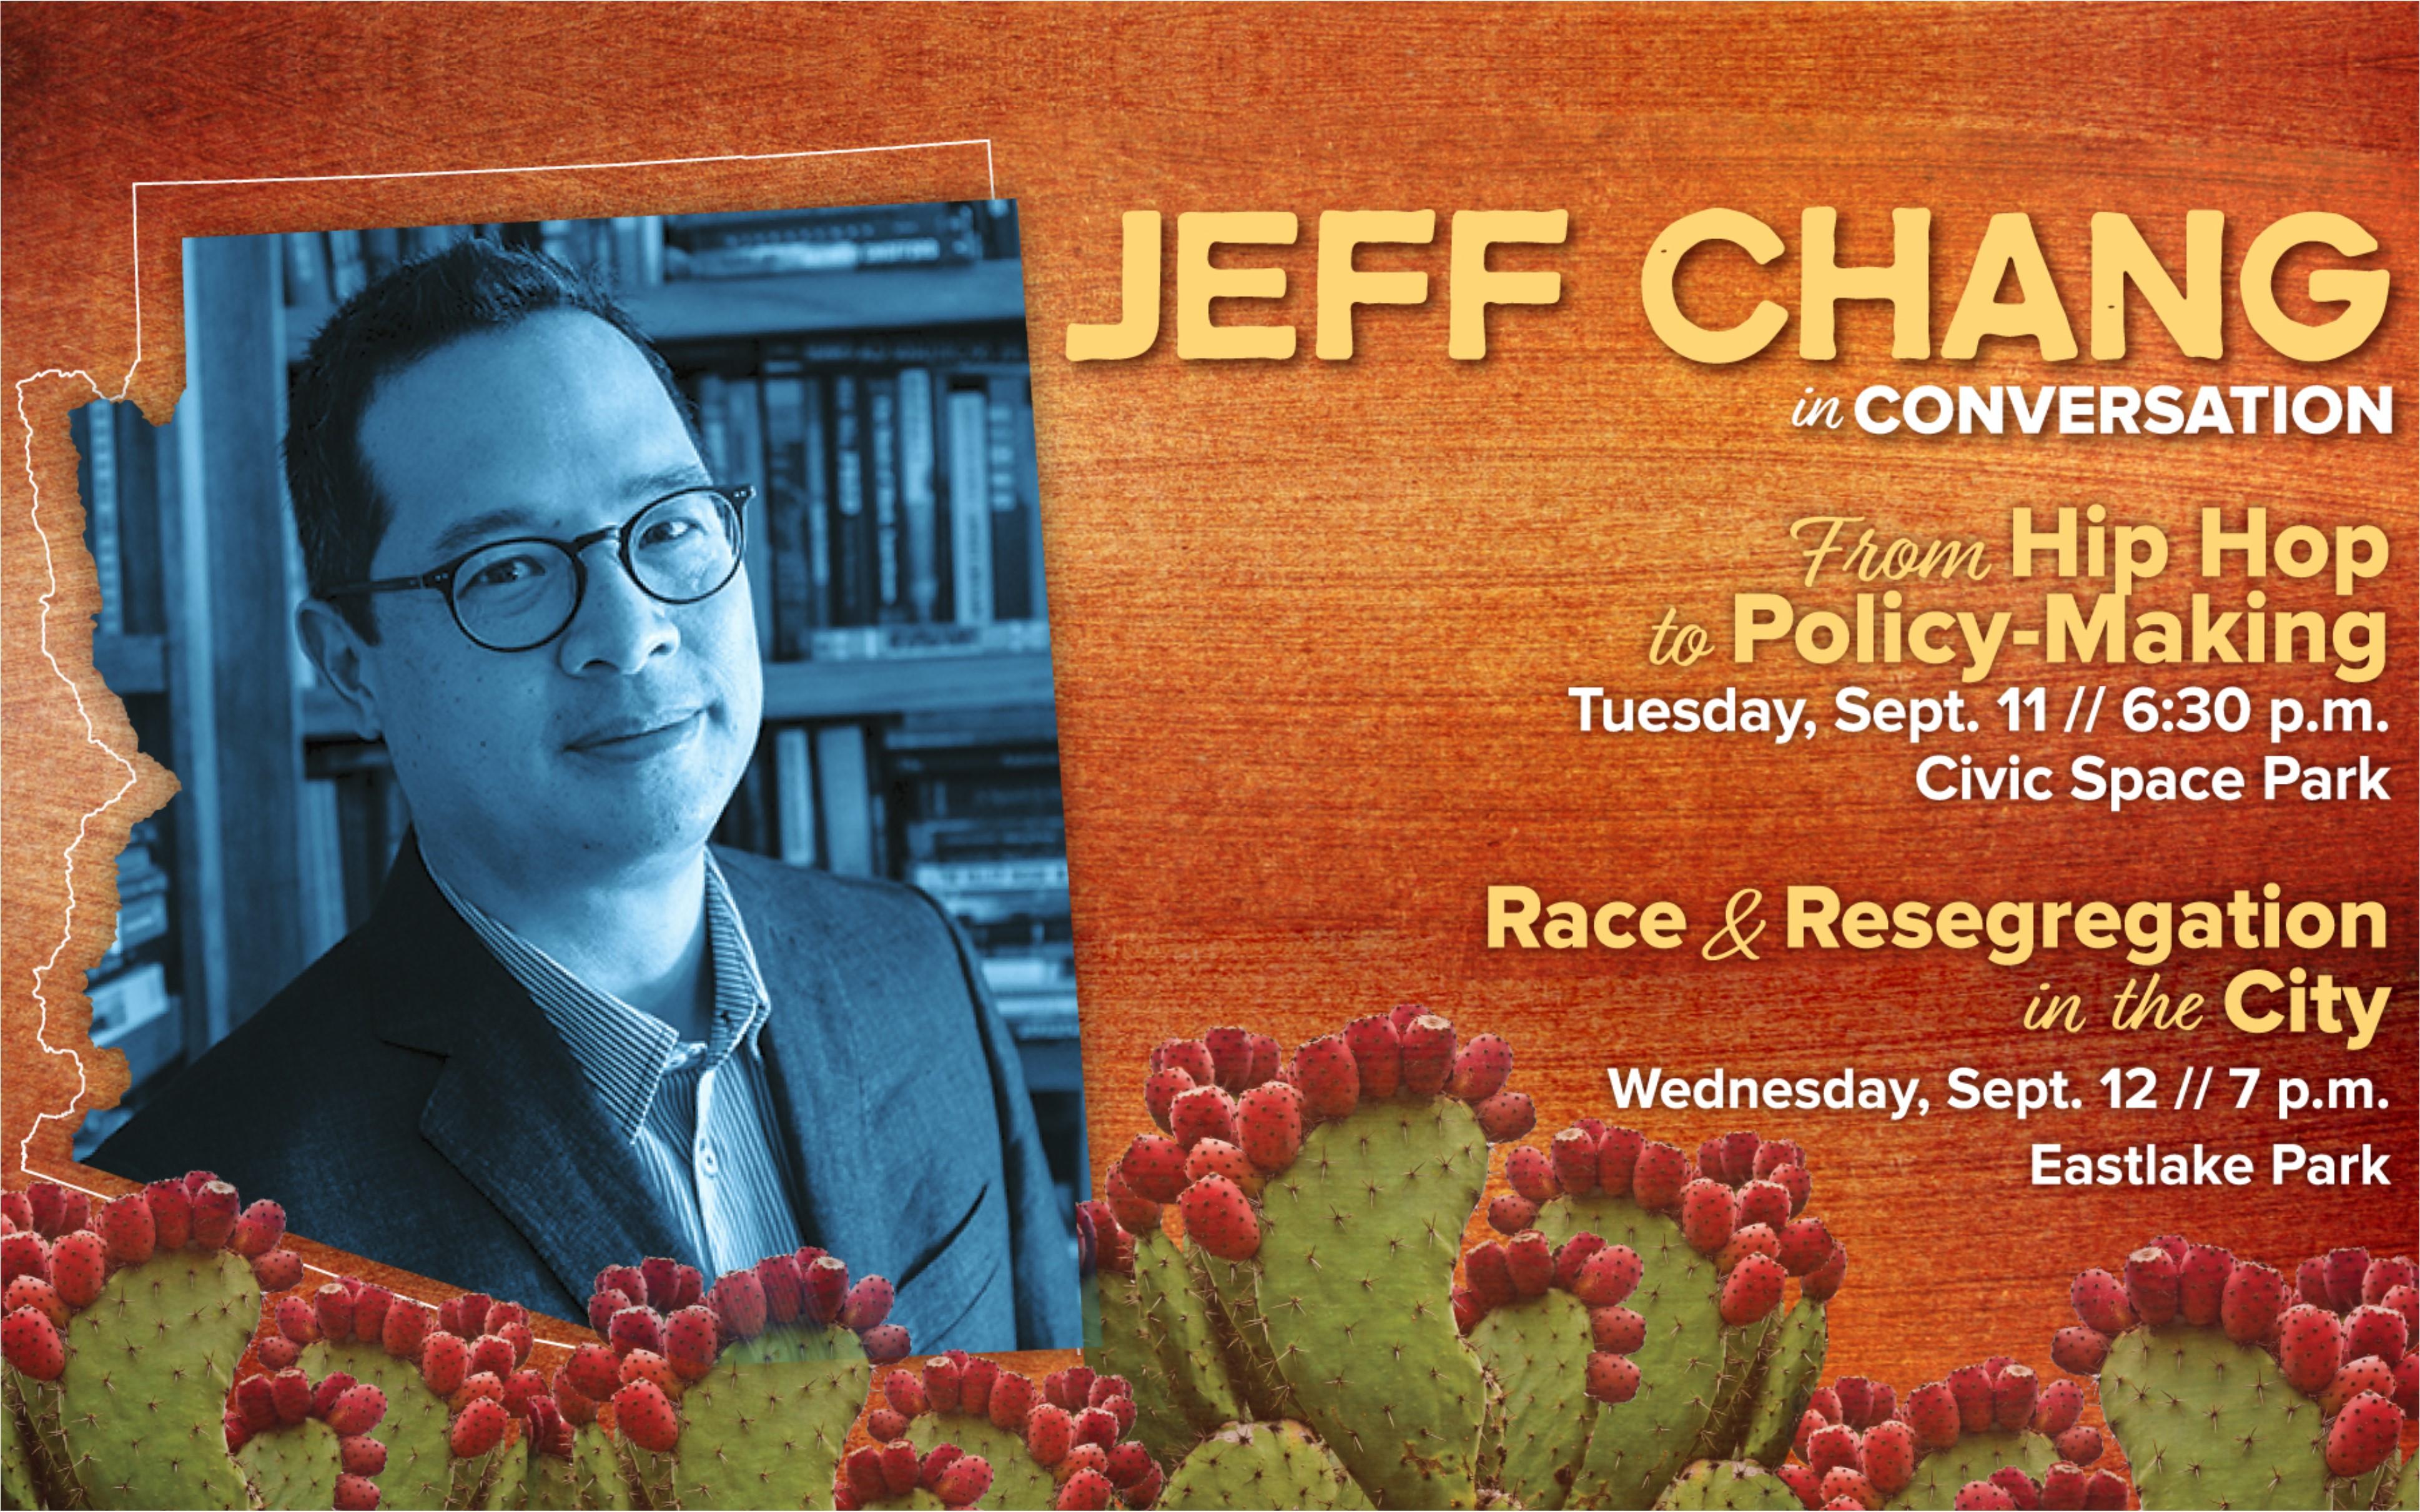 Jeff Chang Flyer